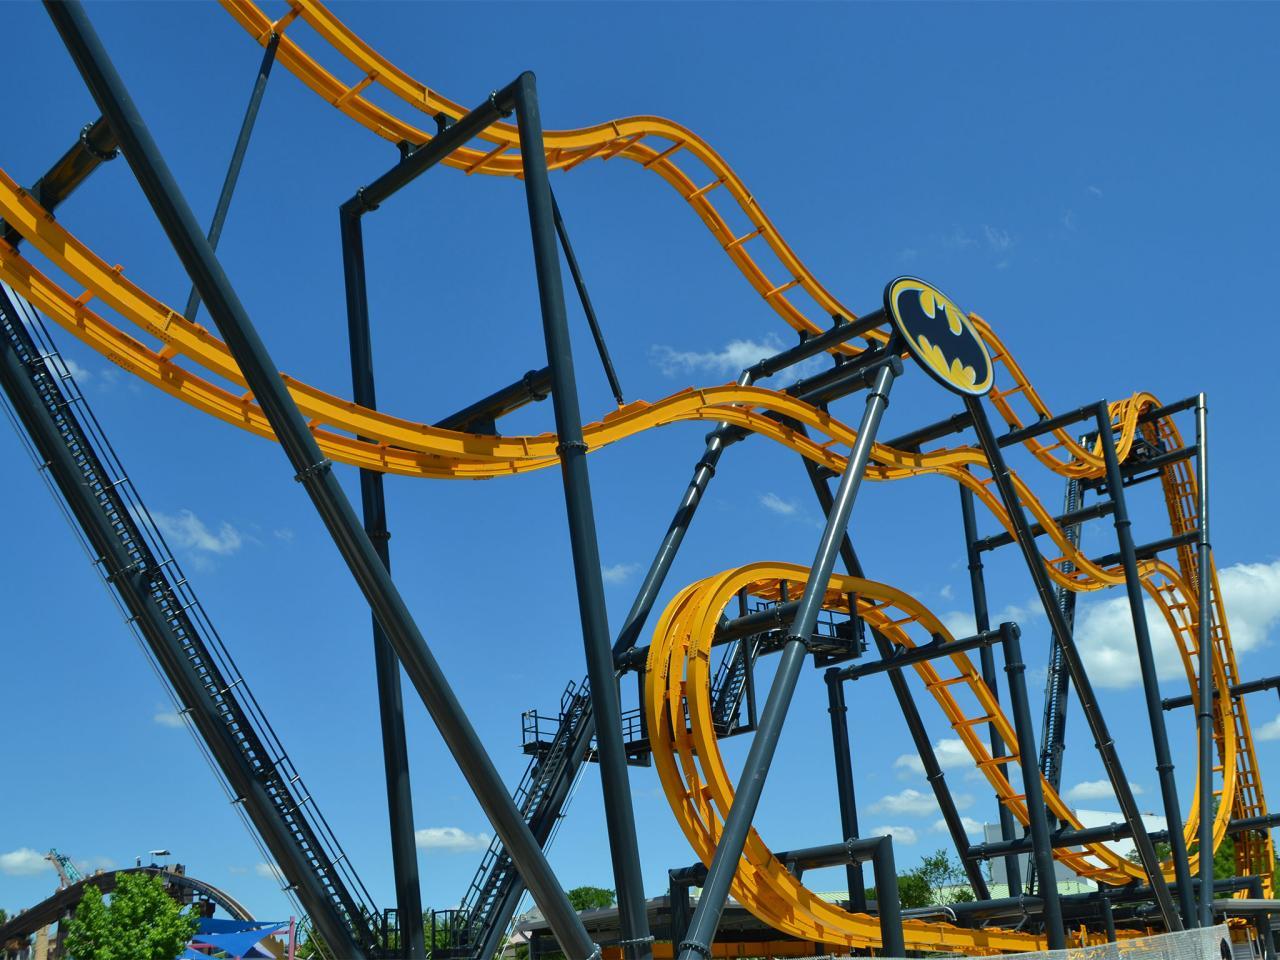 Batman The Ride - Six Flags Fiesta Texas (San Antonio ...